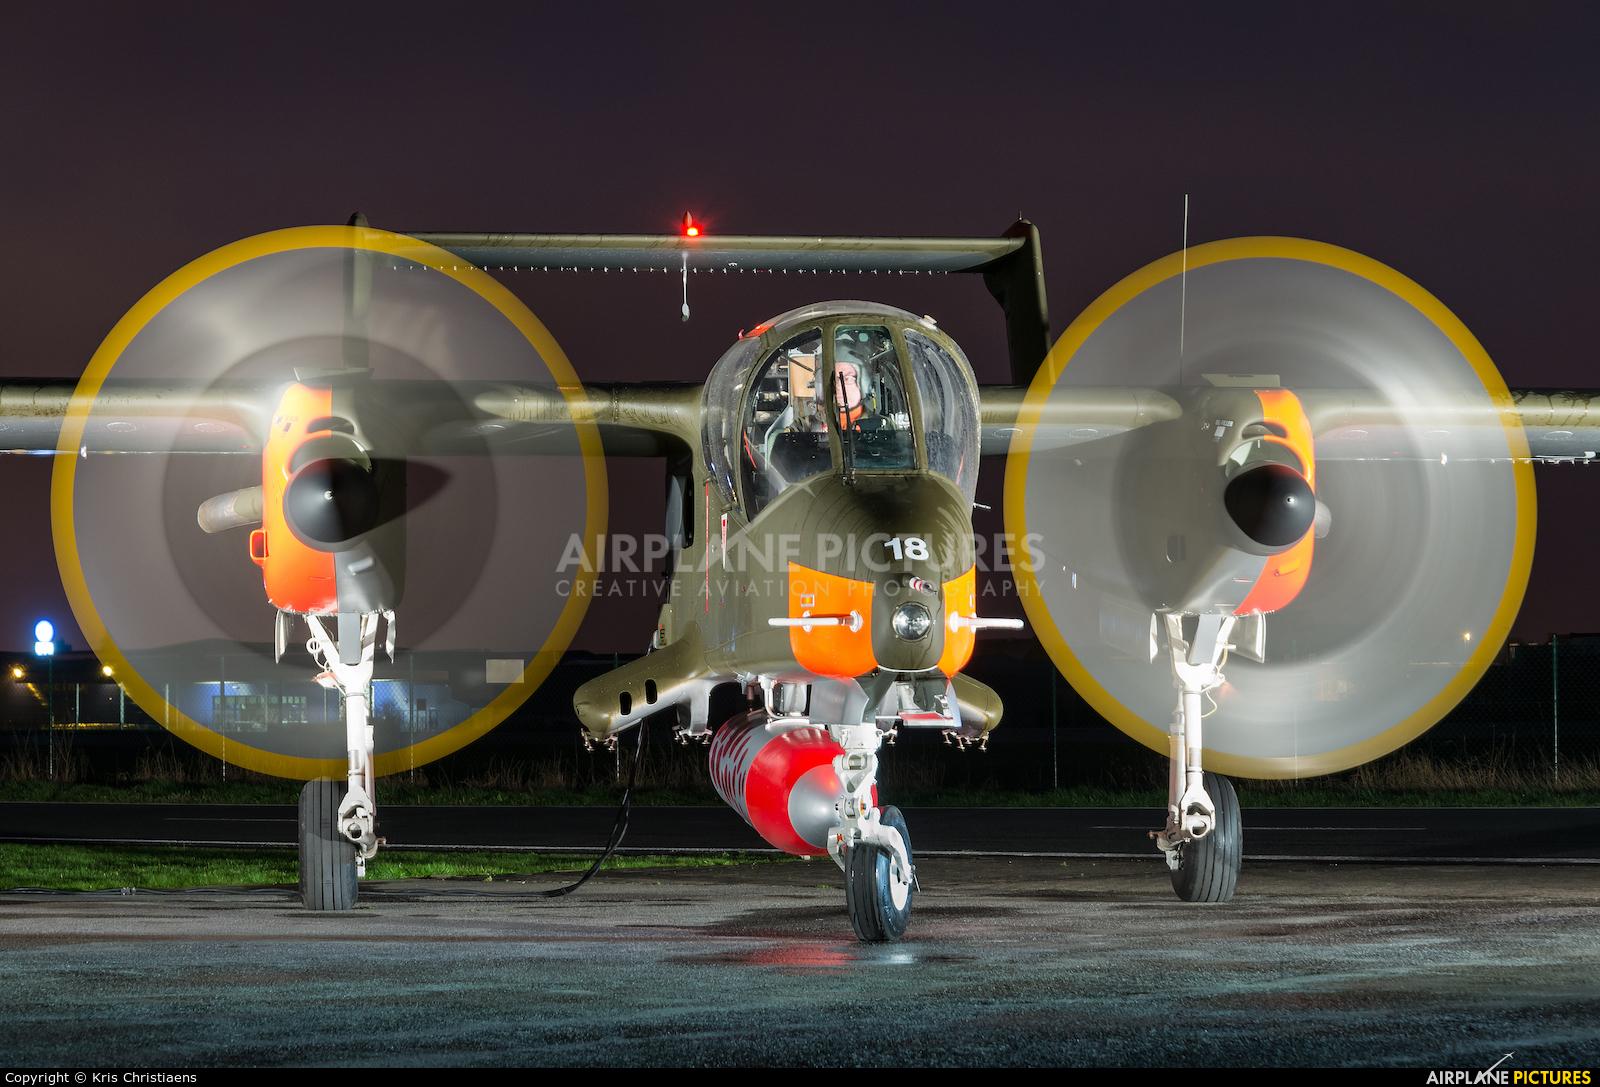 Bronco Demo Team G-ONAA aircraft at Kortrijk-Wevelgem